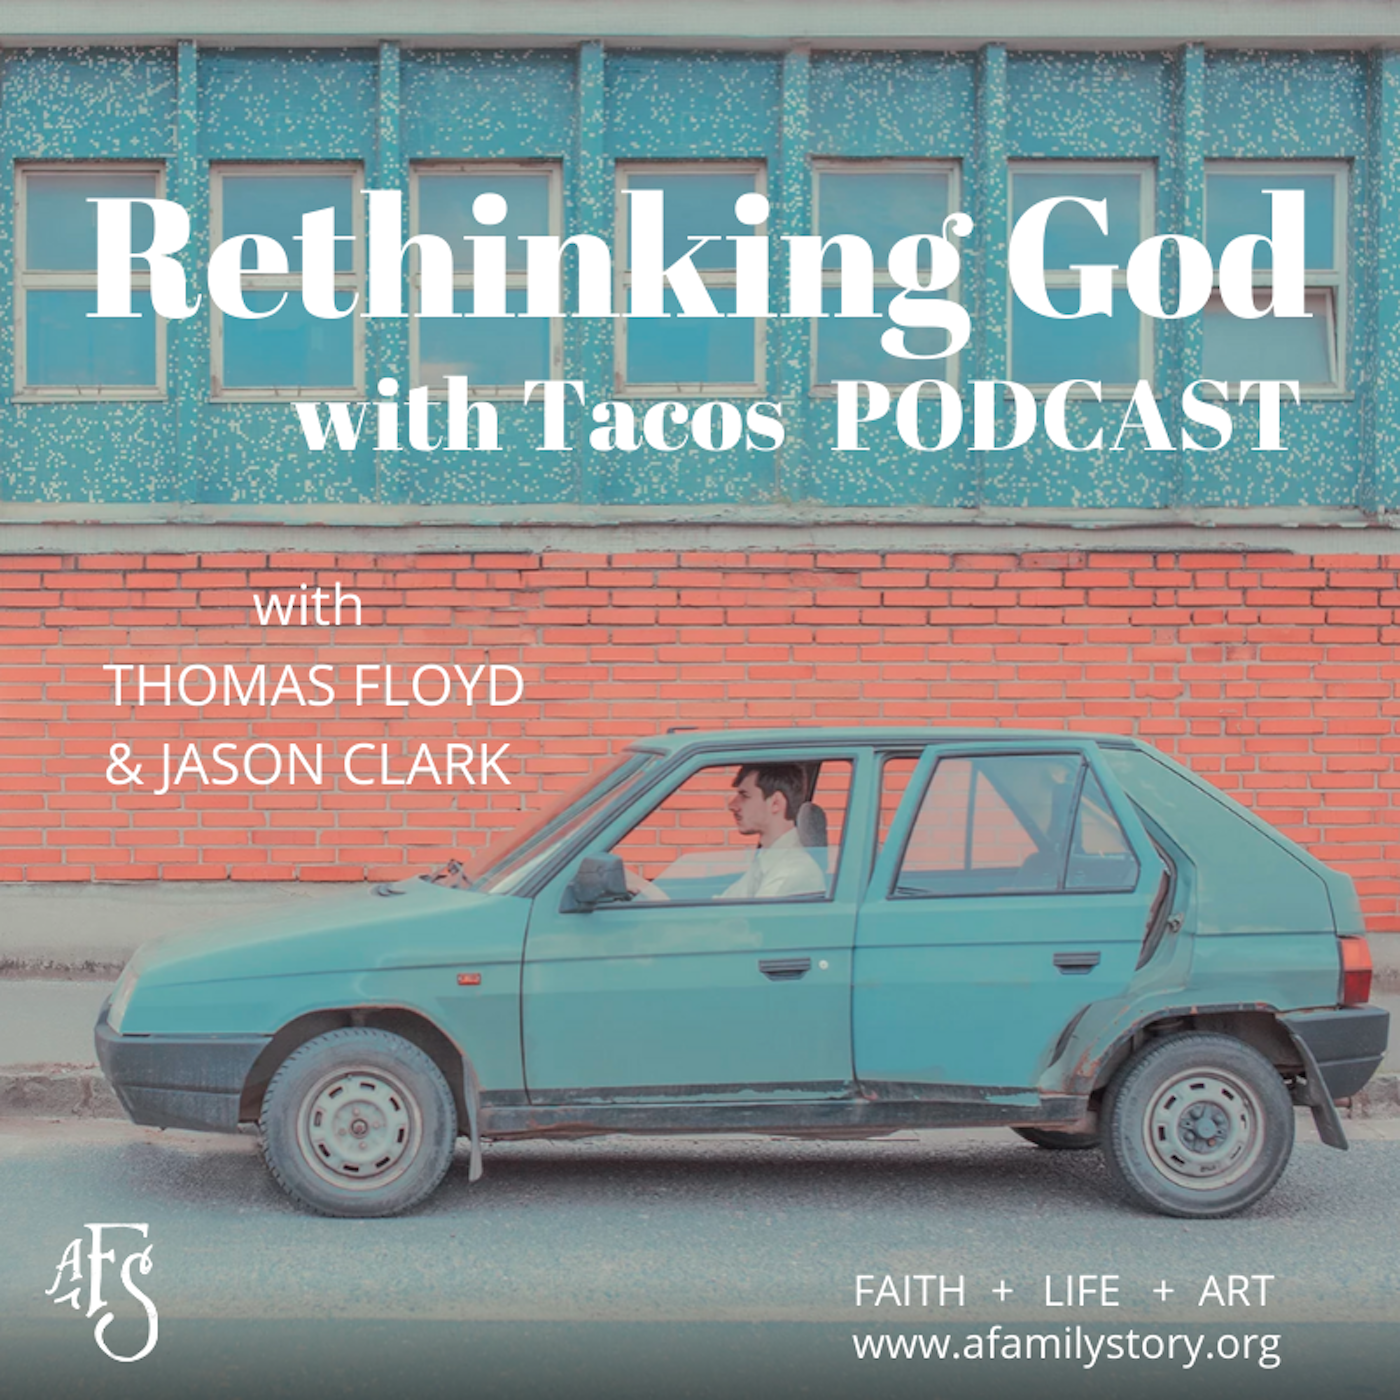 Rethinking God with Tacos Podcast show art